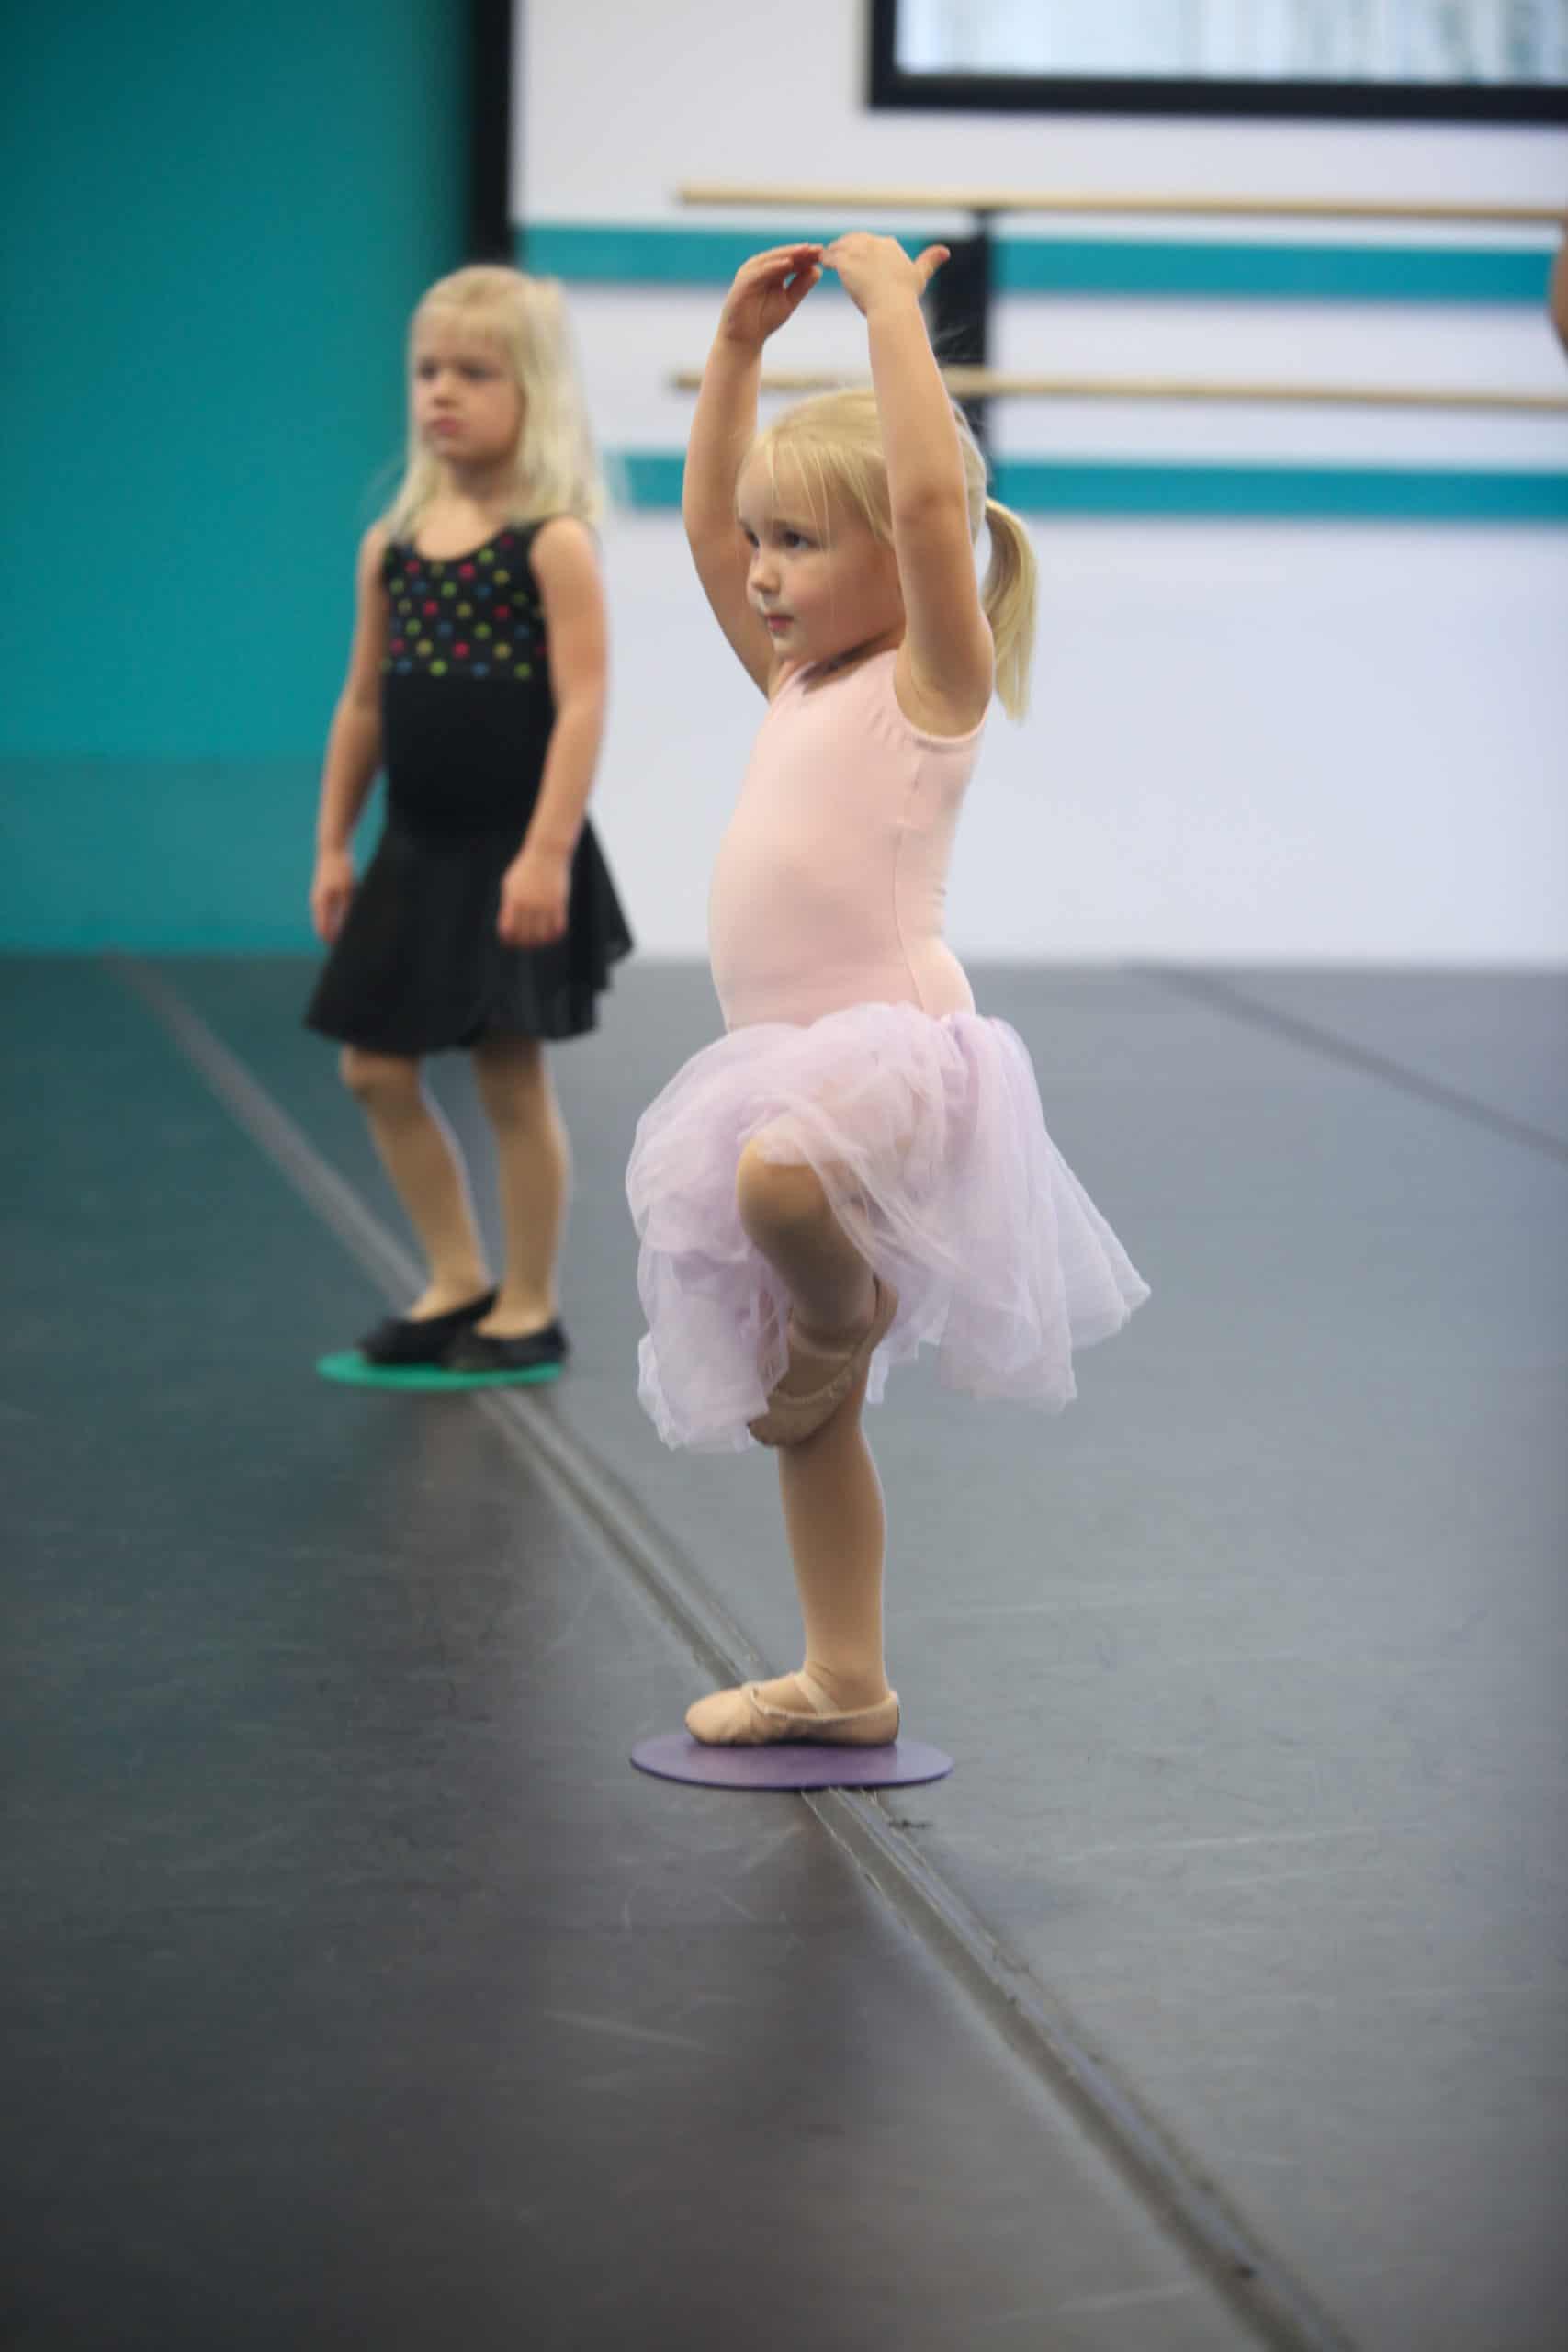 Dancer balancing